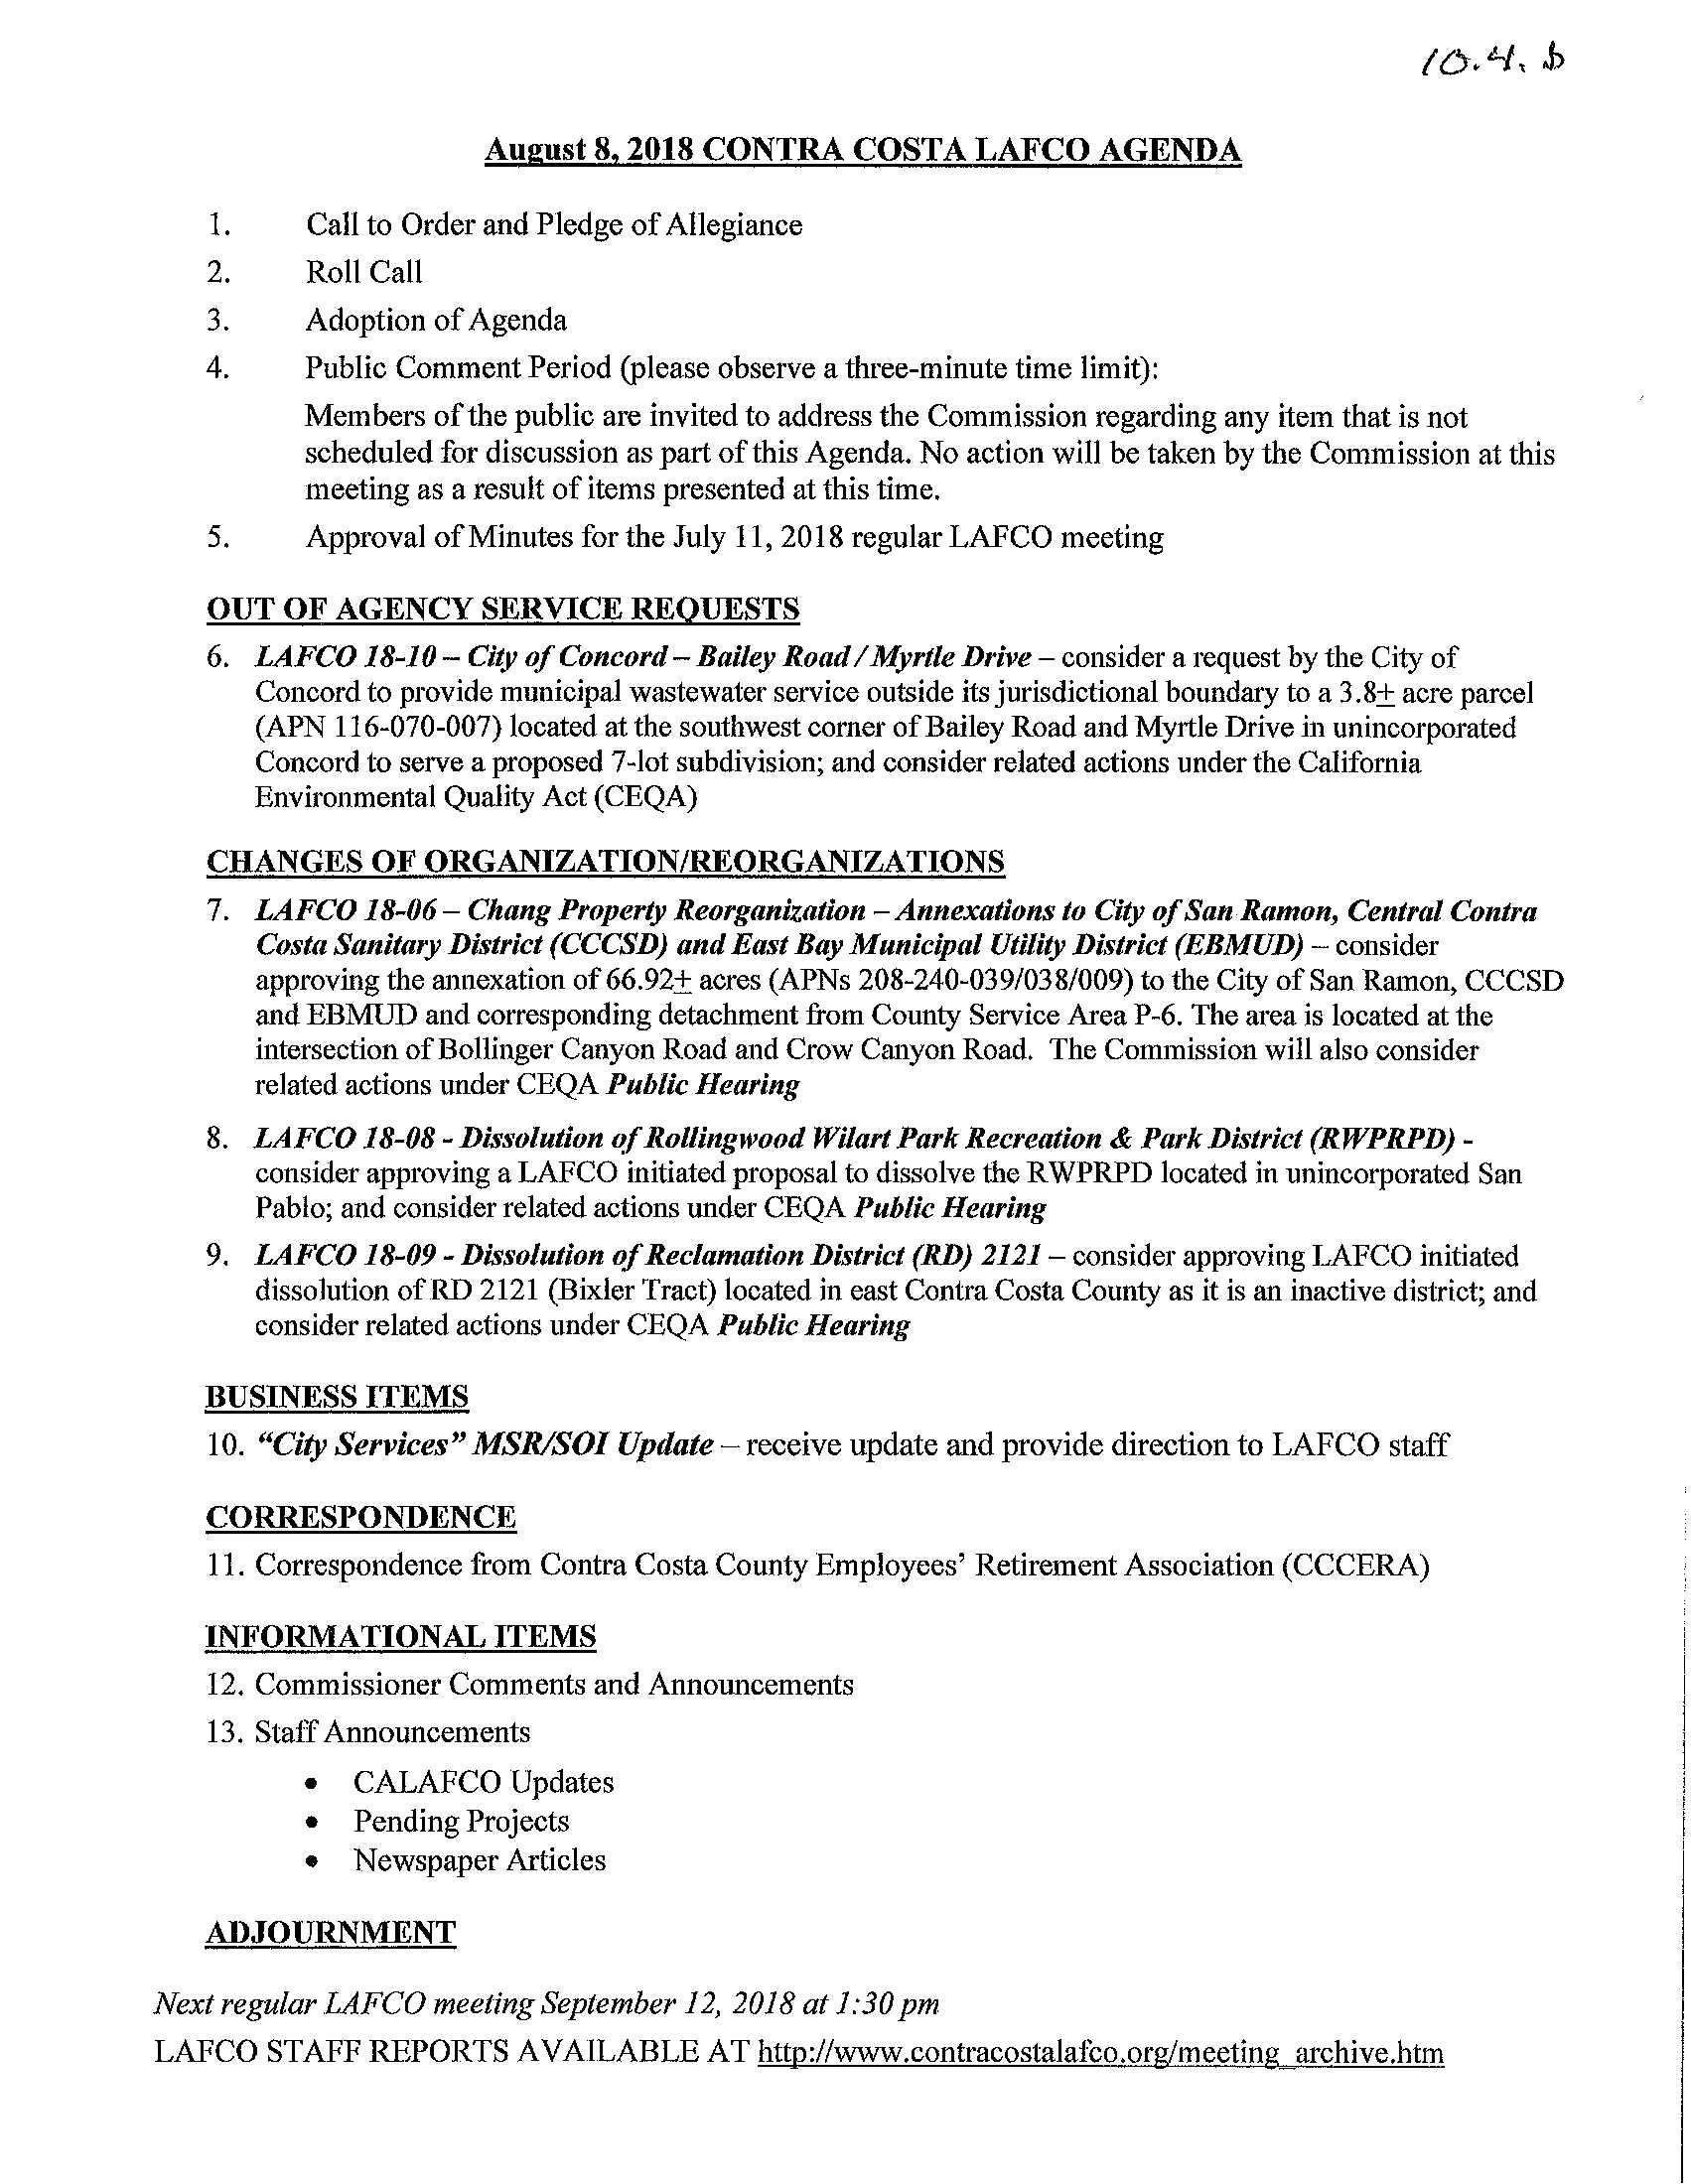 ESMAC Agenda 09.12.2018 (22 Pages)_16.jpg